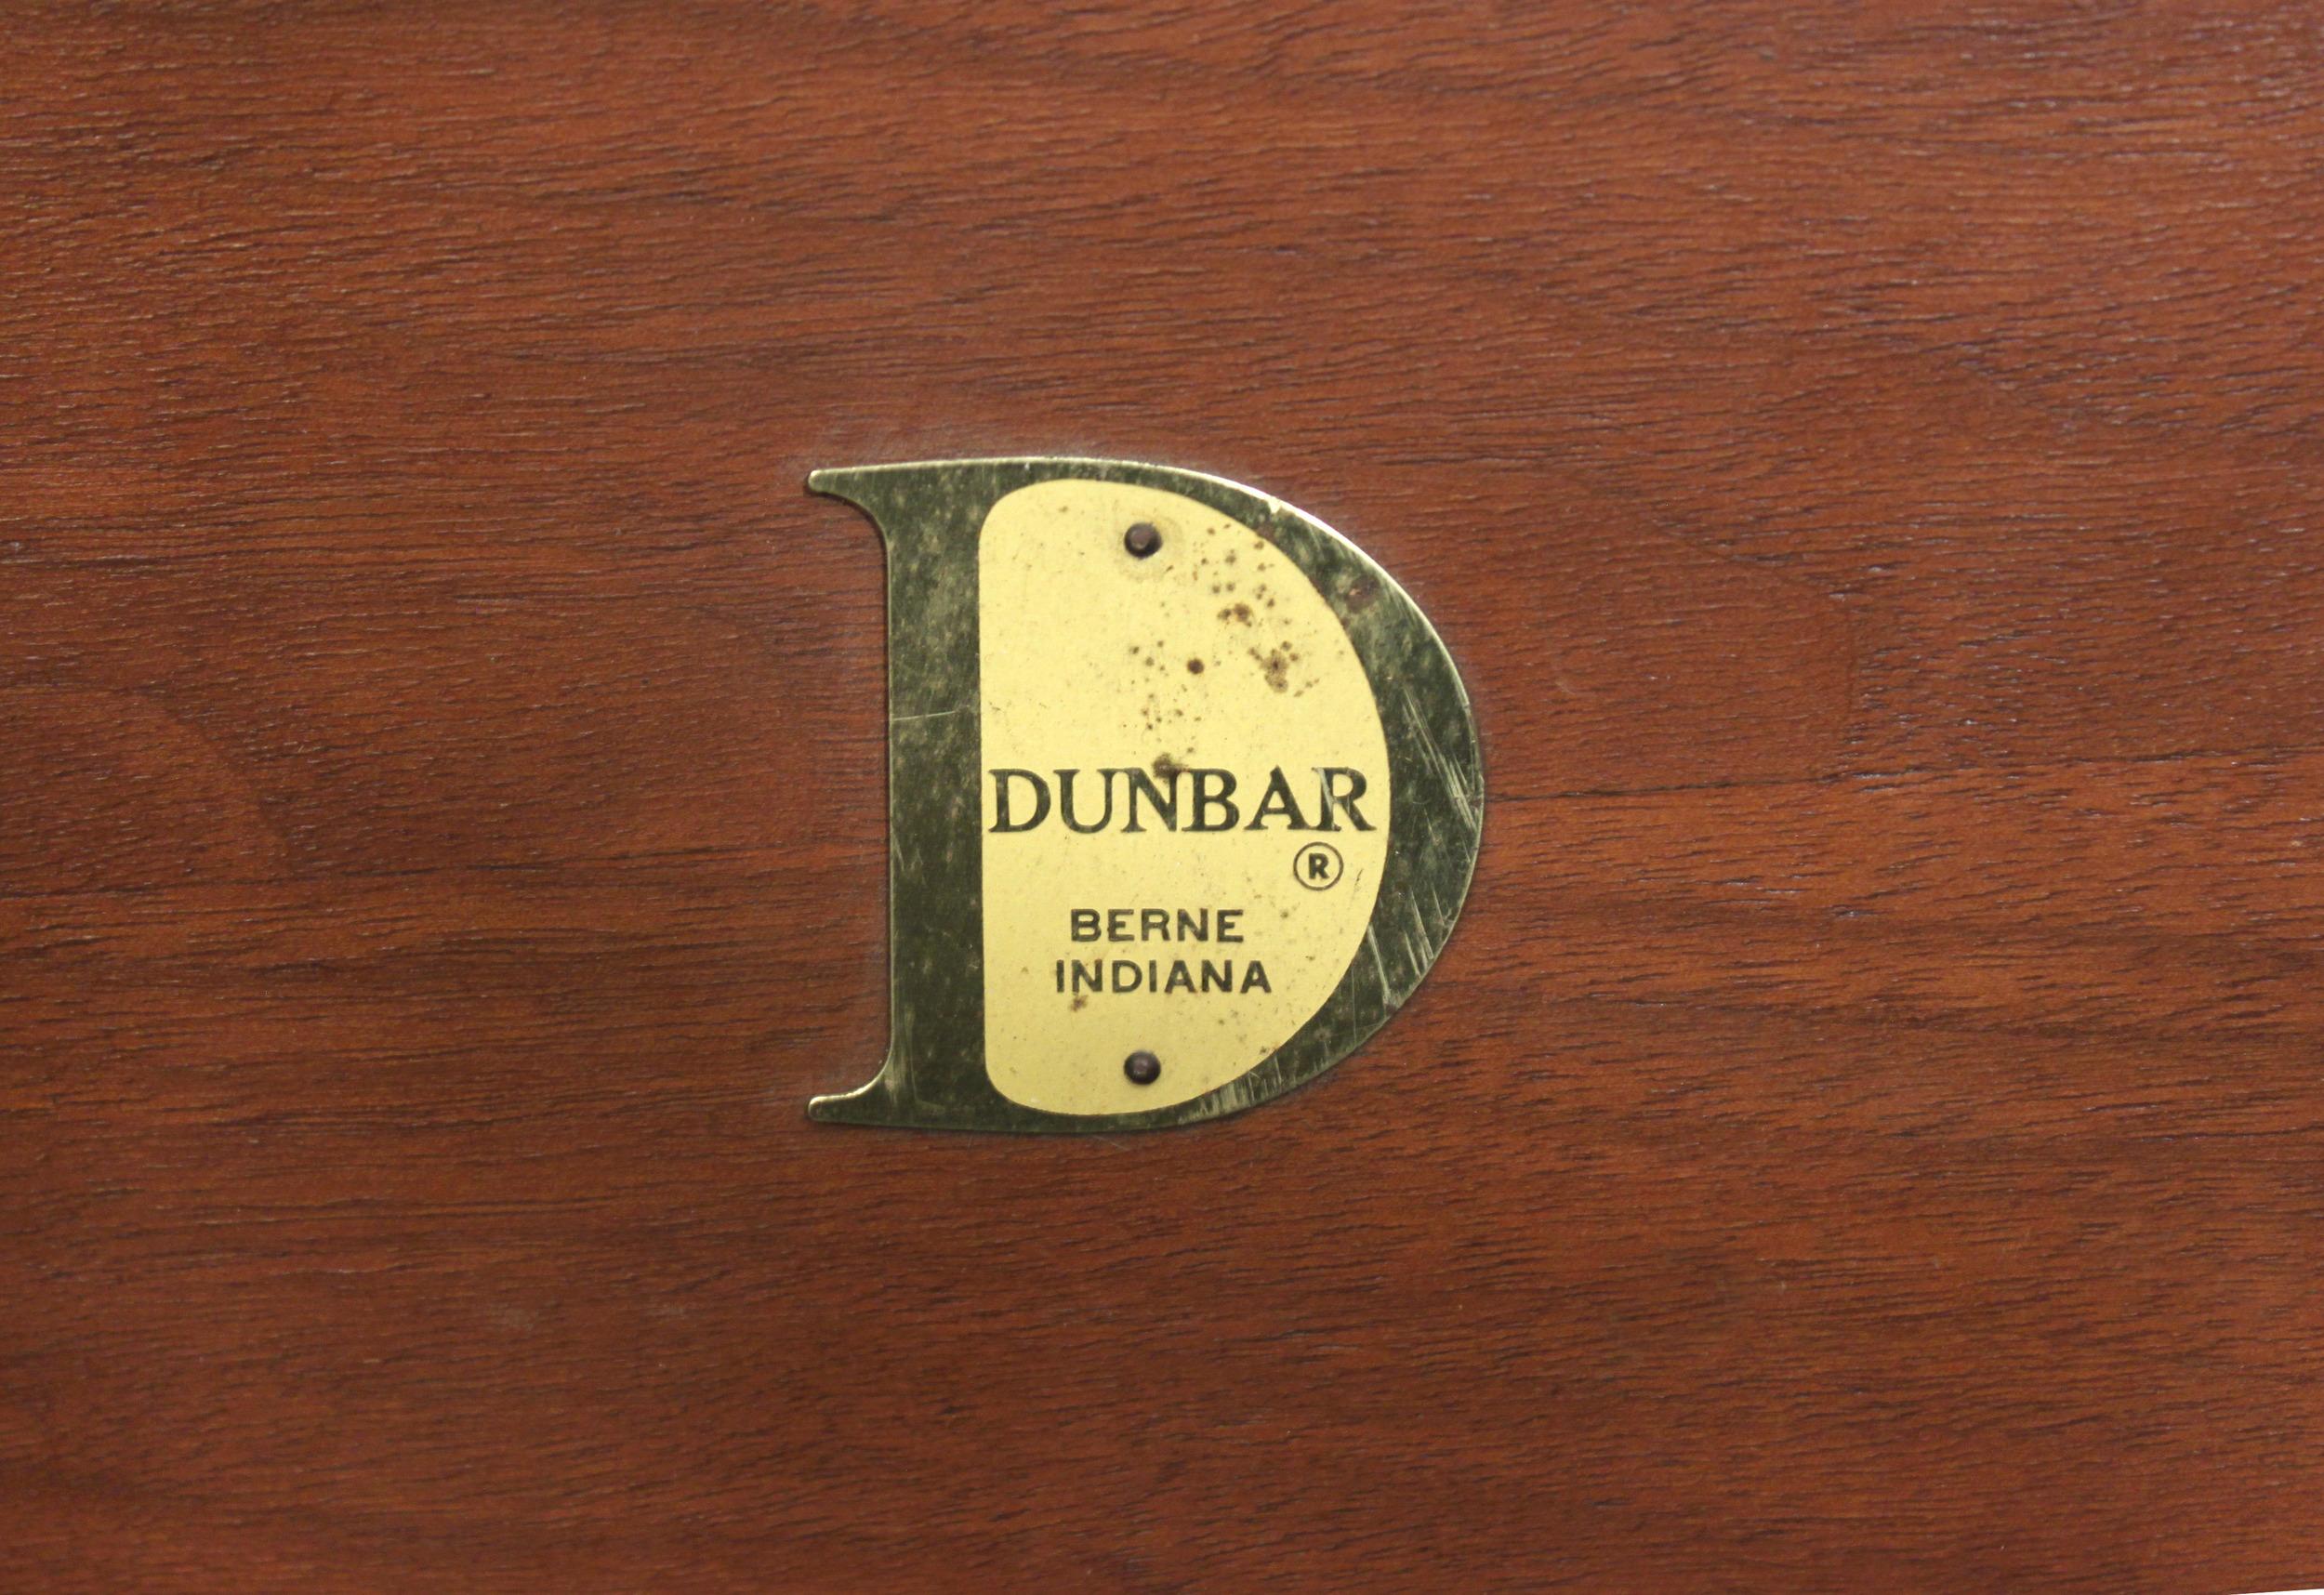 Dunbar 35 walnut parsons table endtable26 detail 2 hires.jpg